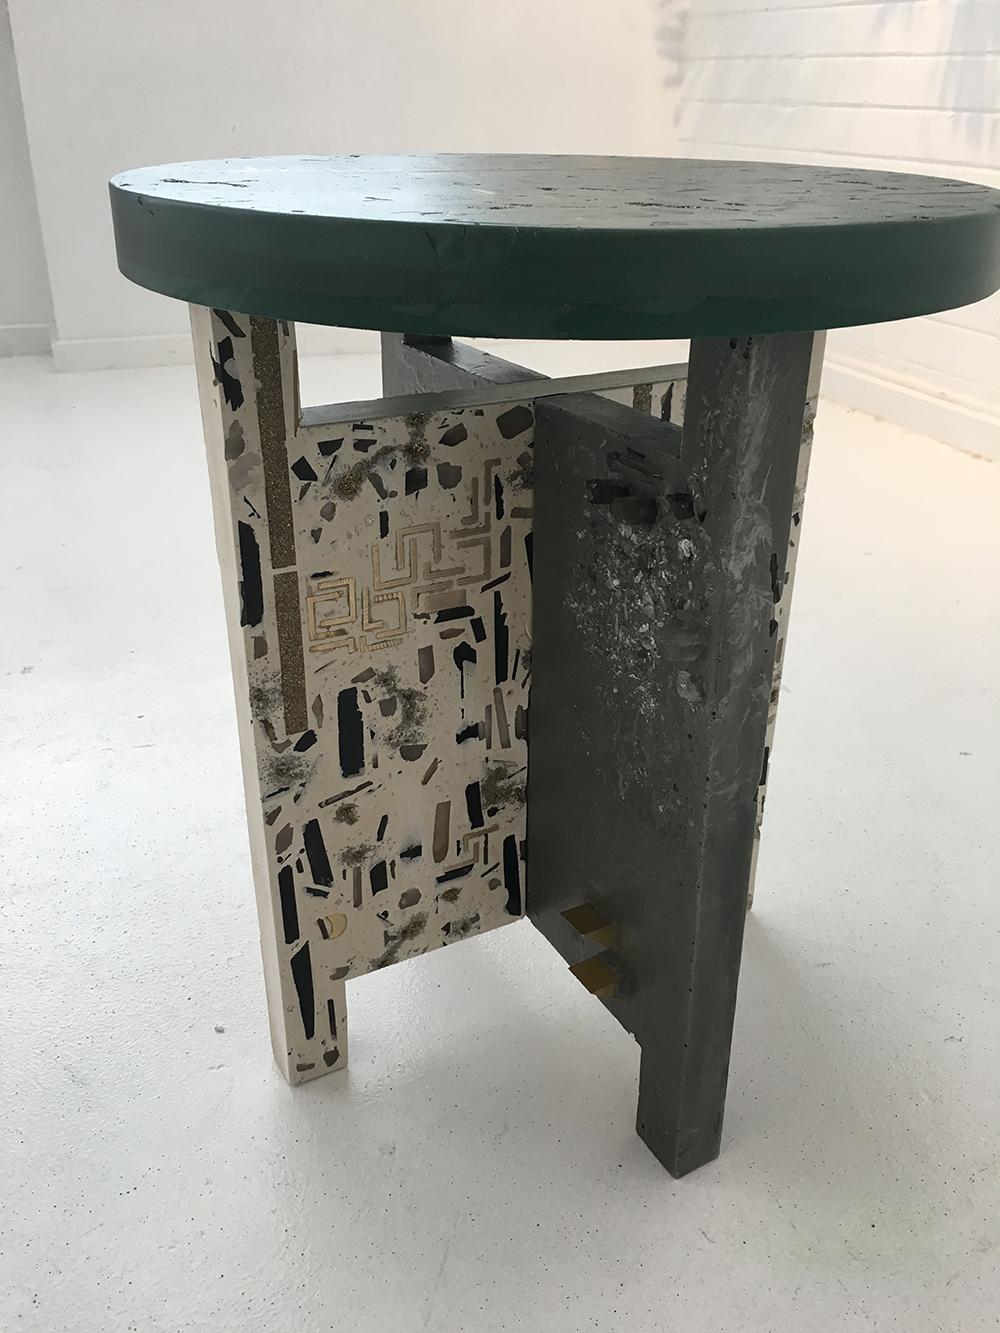 CBoots_Platto Table_Image 8